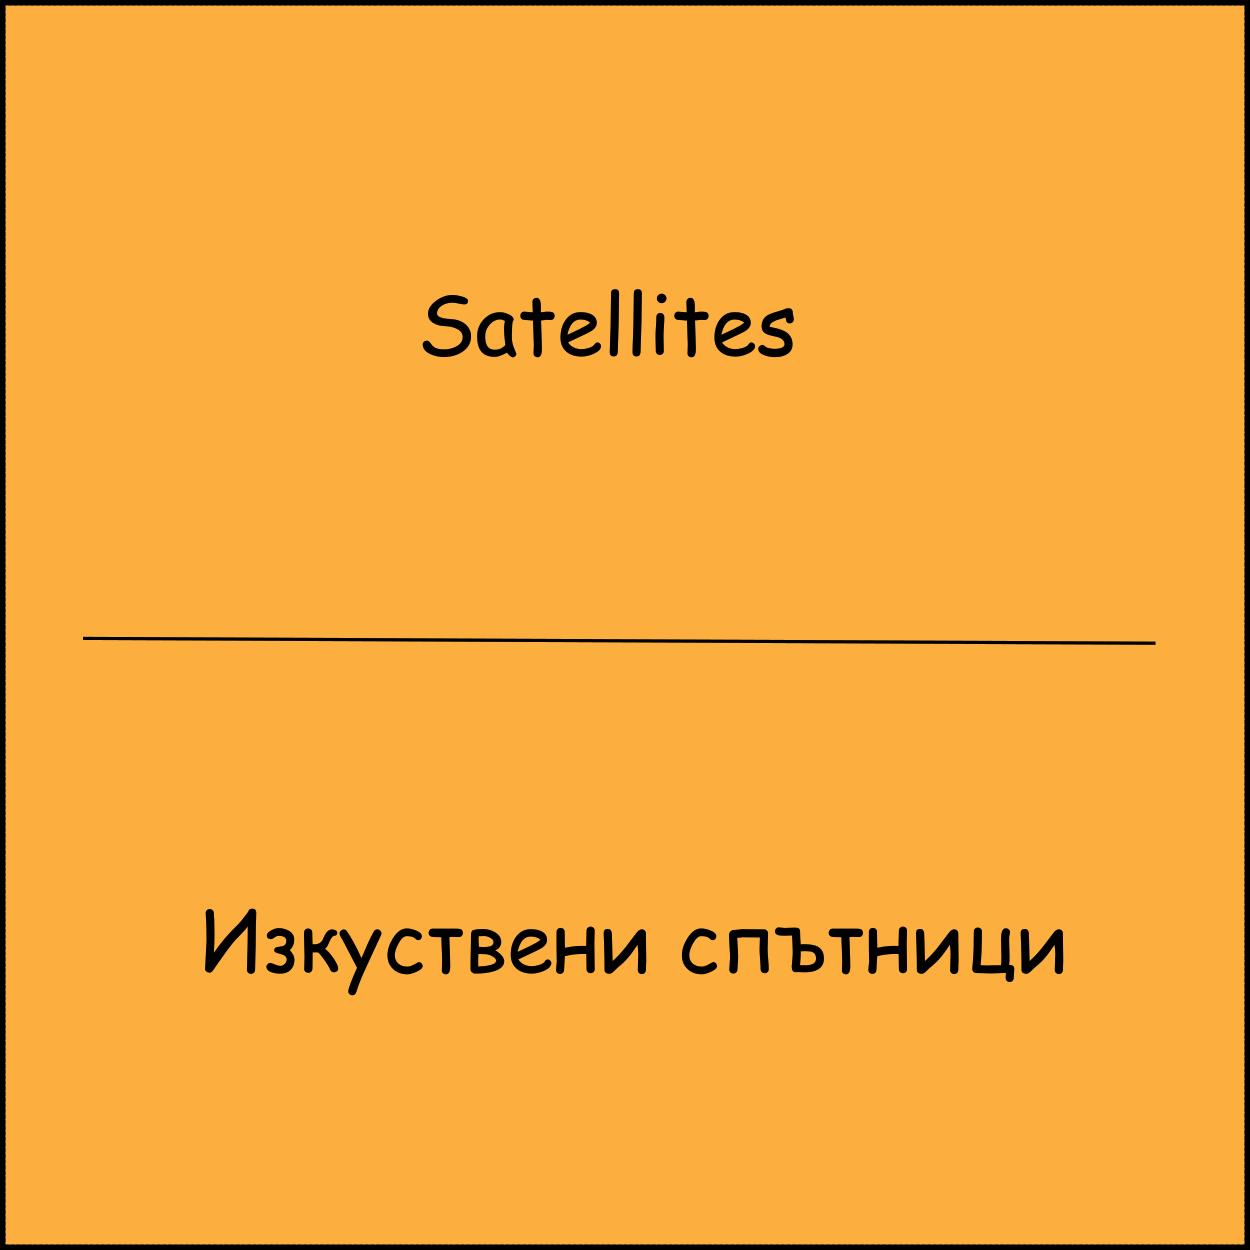 Satellites / Спътници